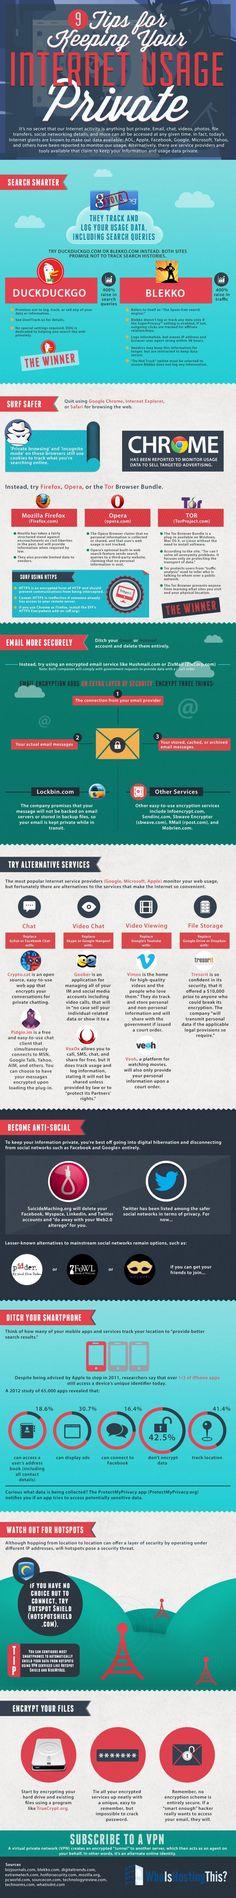 Infographie 95 -internet-usage-privacy Plus